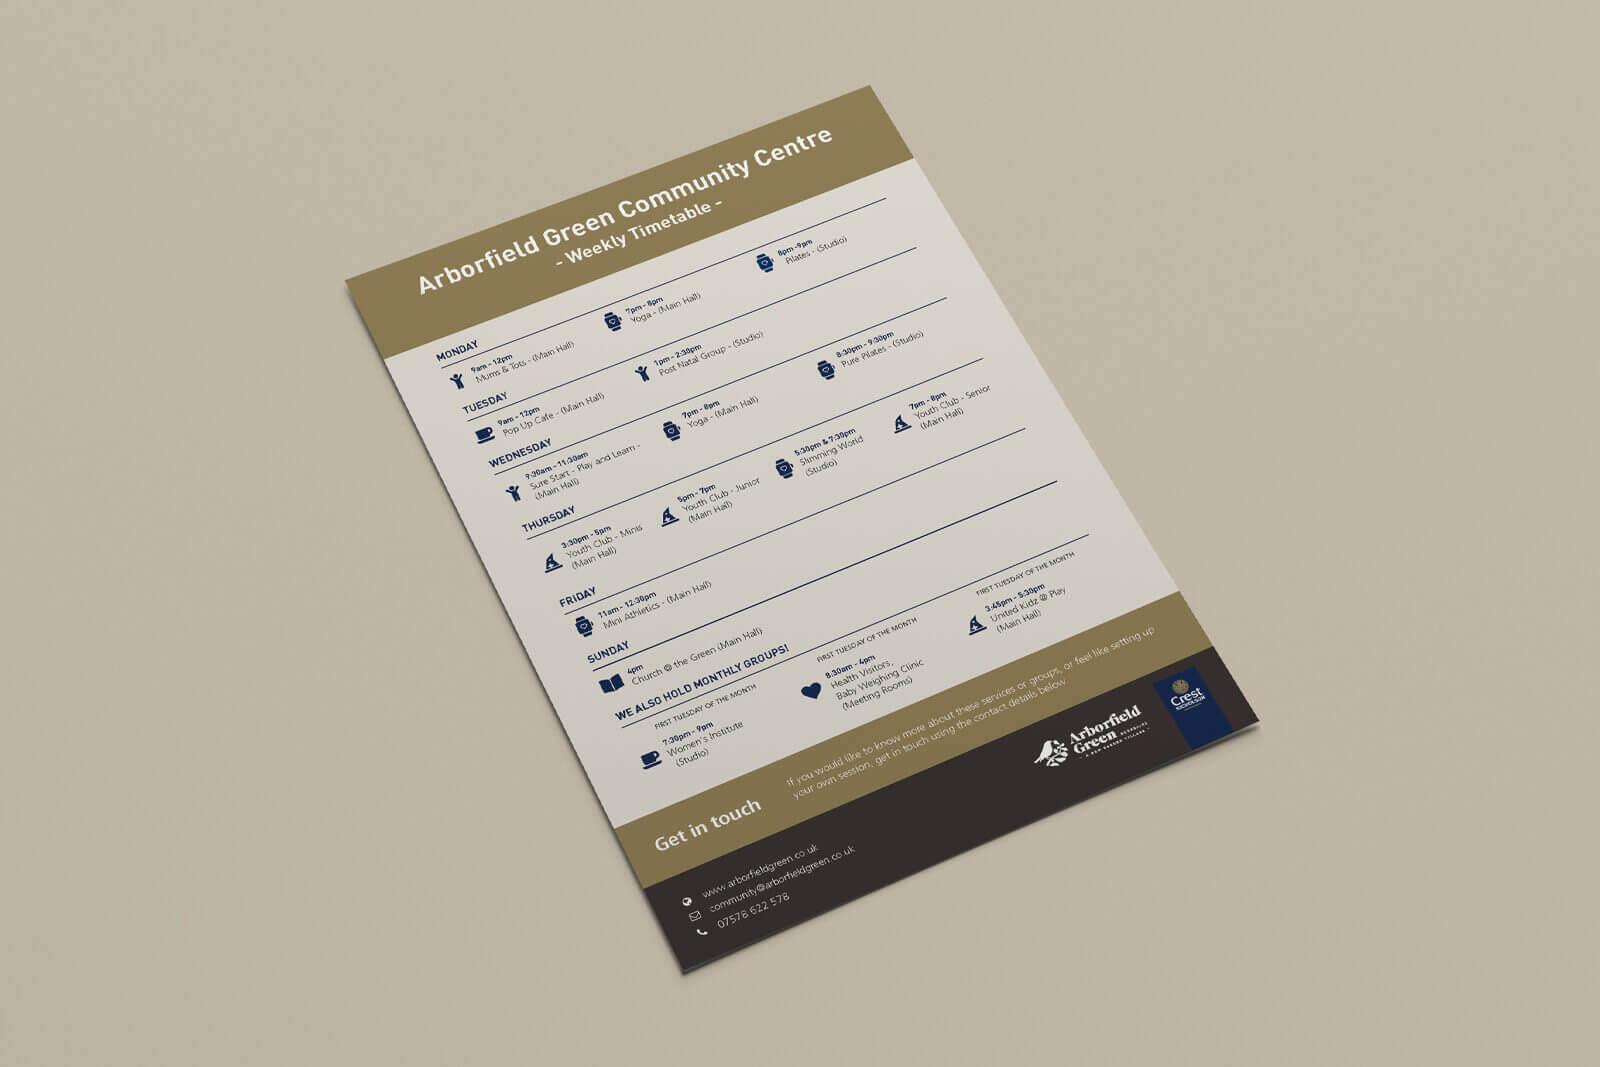 Arborfield Green - Community Centre timetable